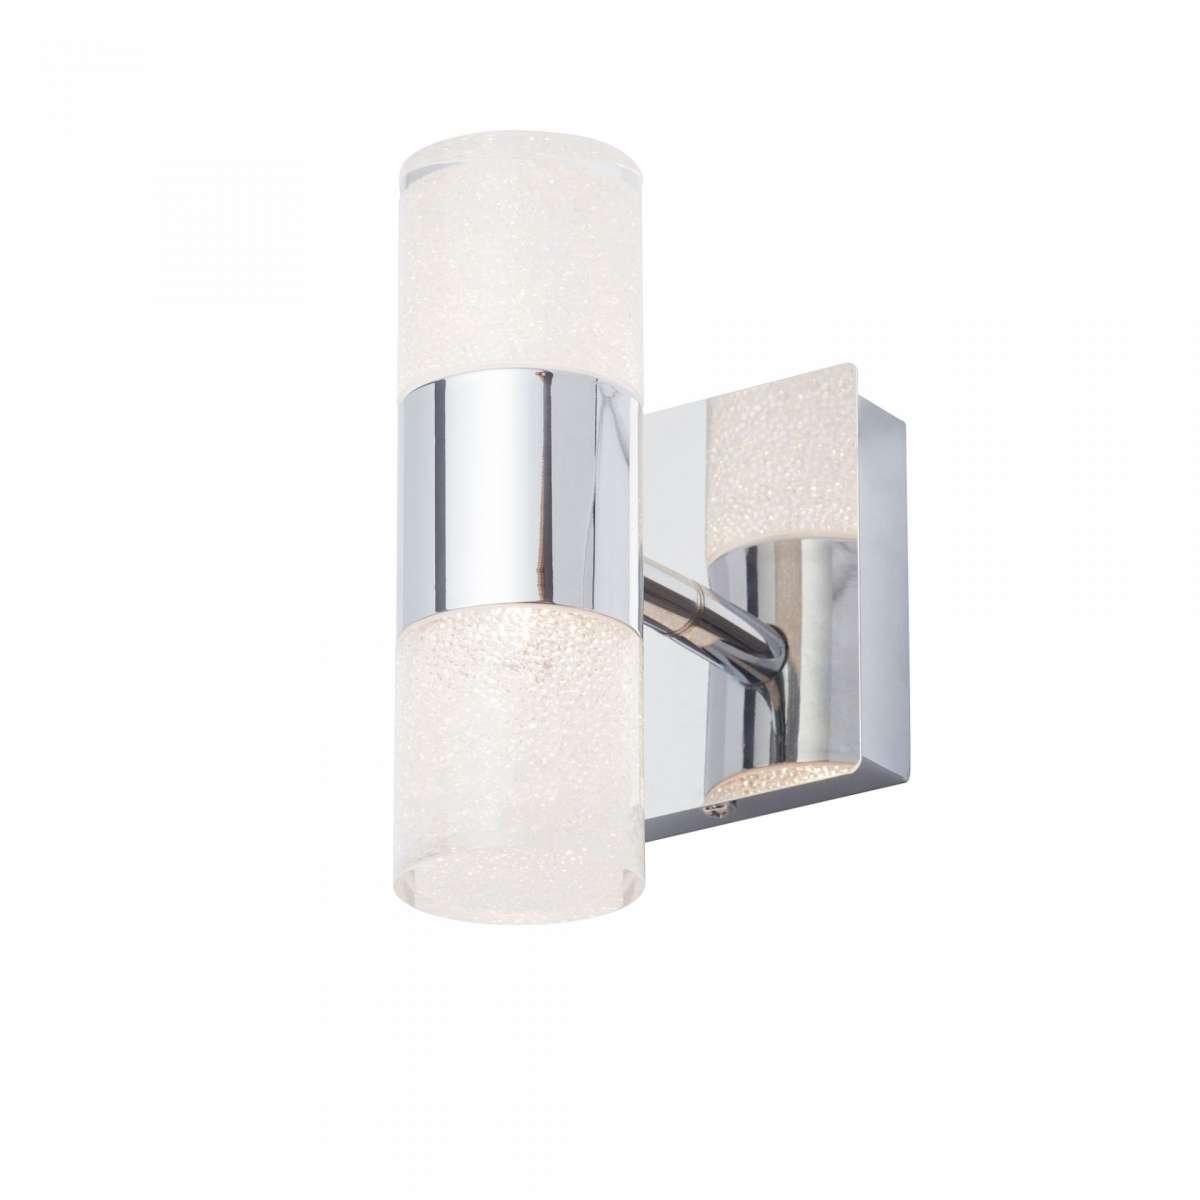 Oslo LED Bathroom Wall Light IP44